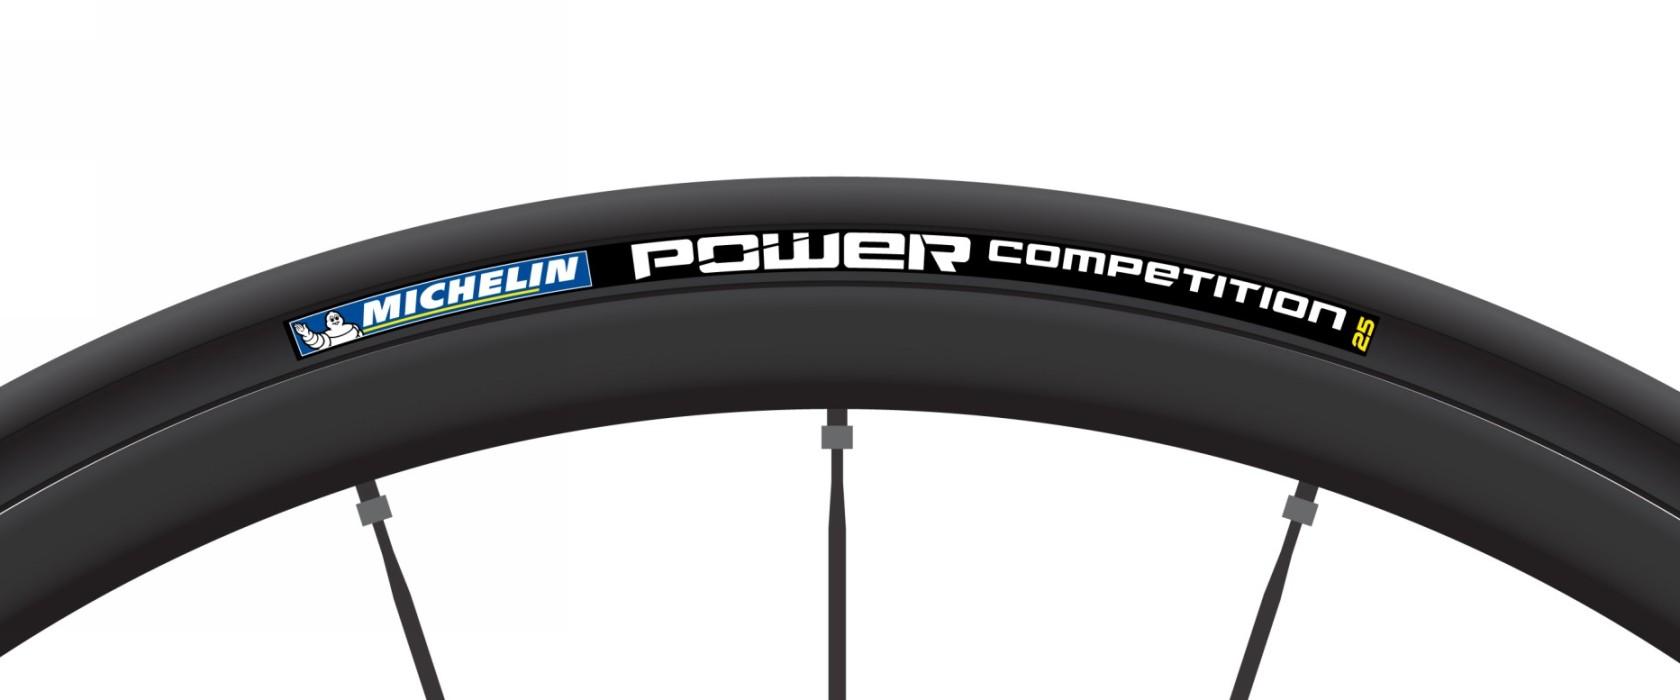 MichelinPower_Competition_2D